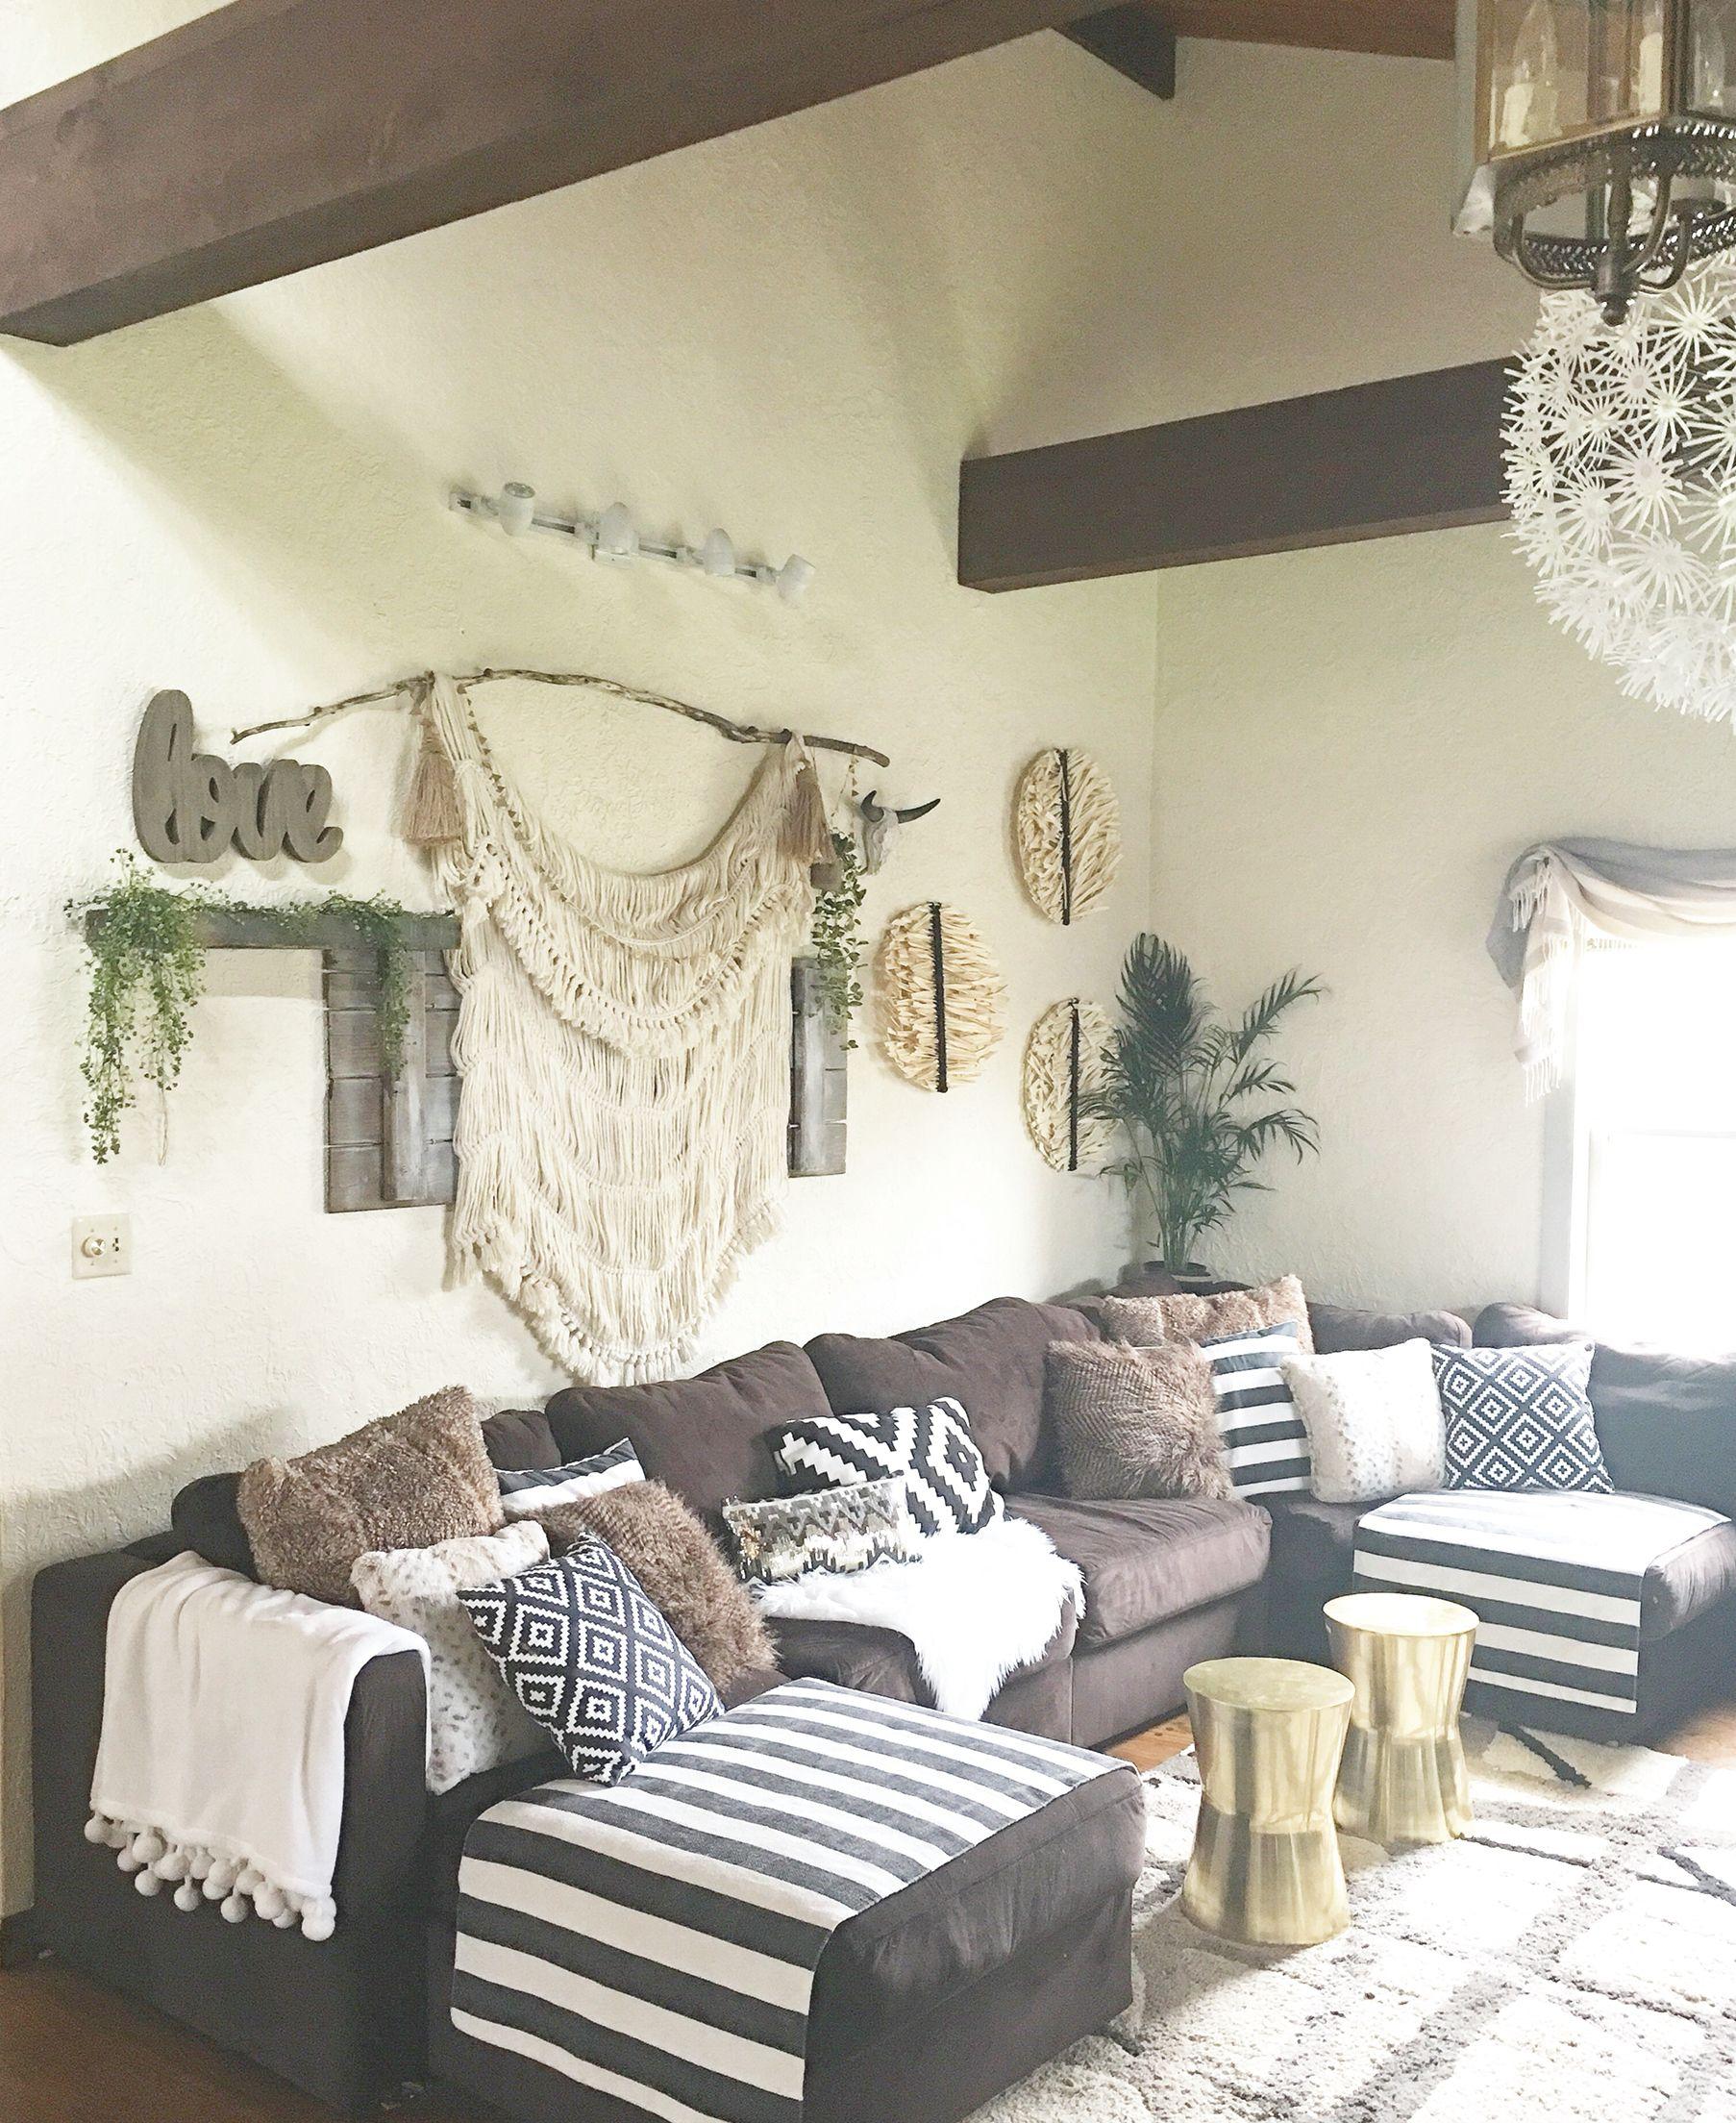 Boho Rustic Glam Living Room By Blissfully Eclectic Rustic Glam Living Room Bohemian Living Rooms Farm House Living Room